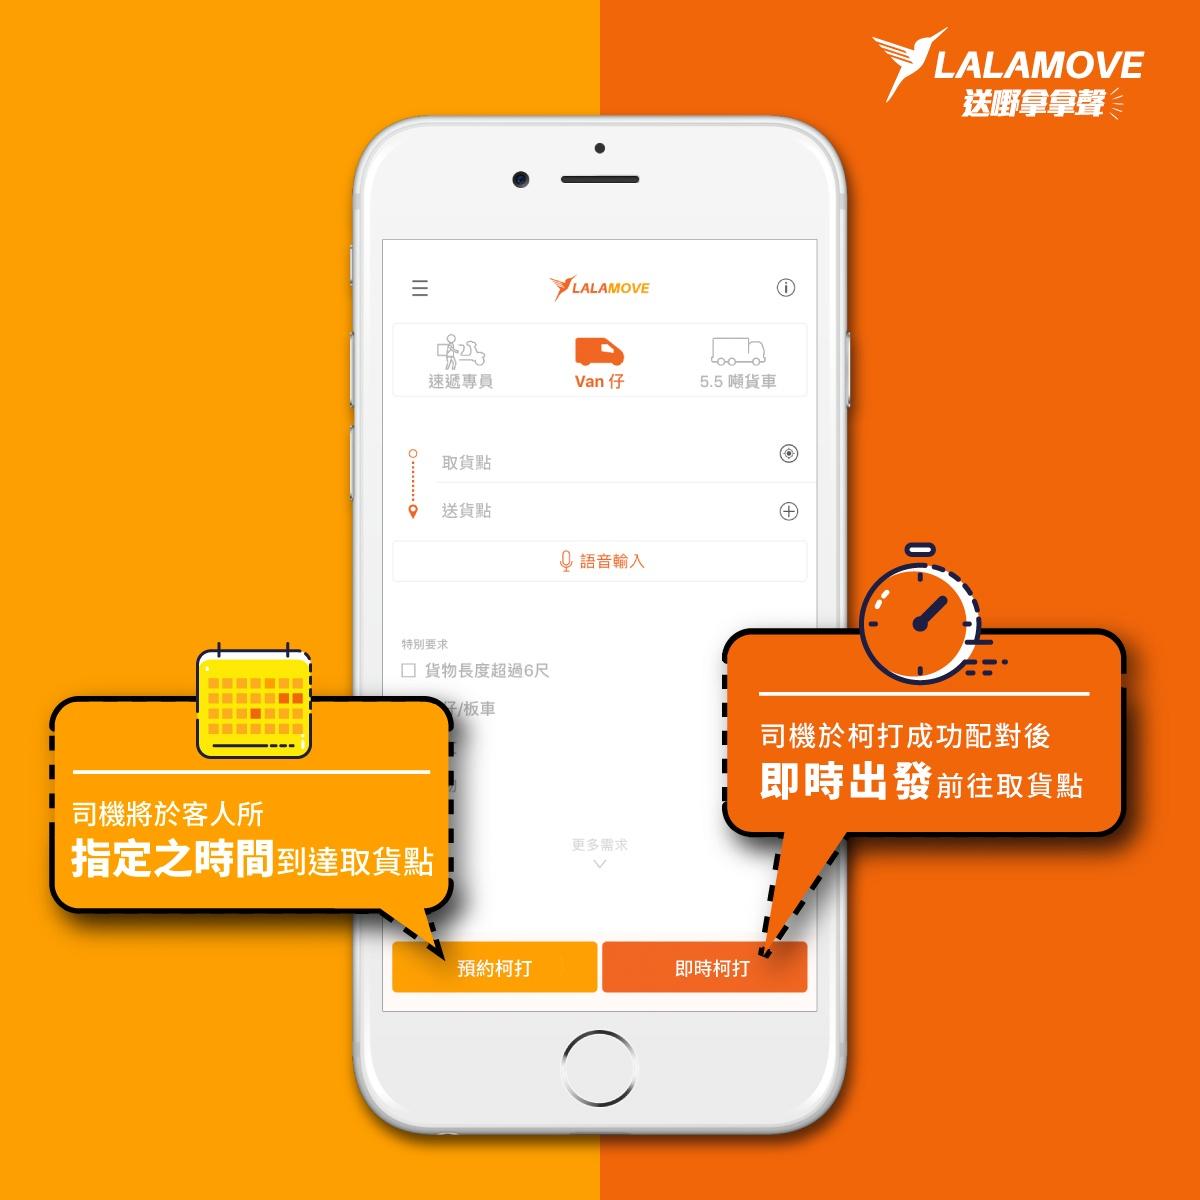 HK_app_lmmediste_Scheduled_20180807-04